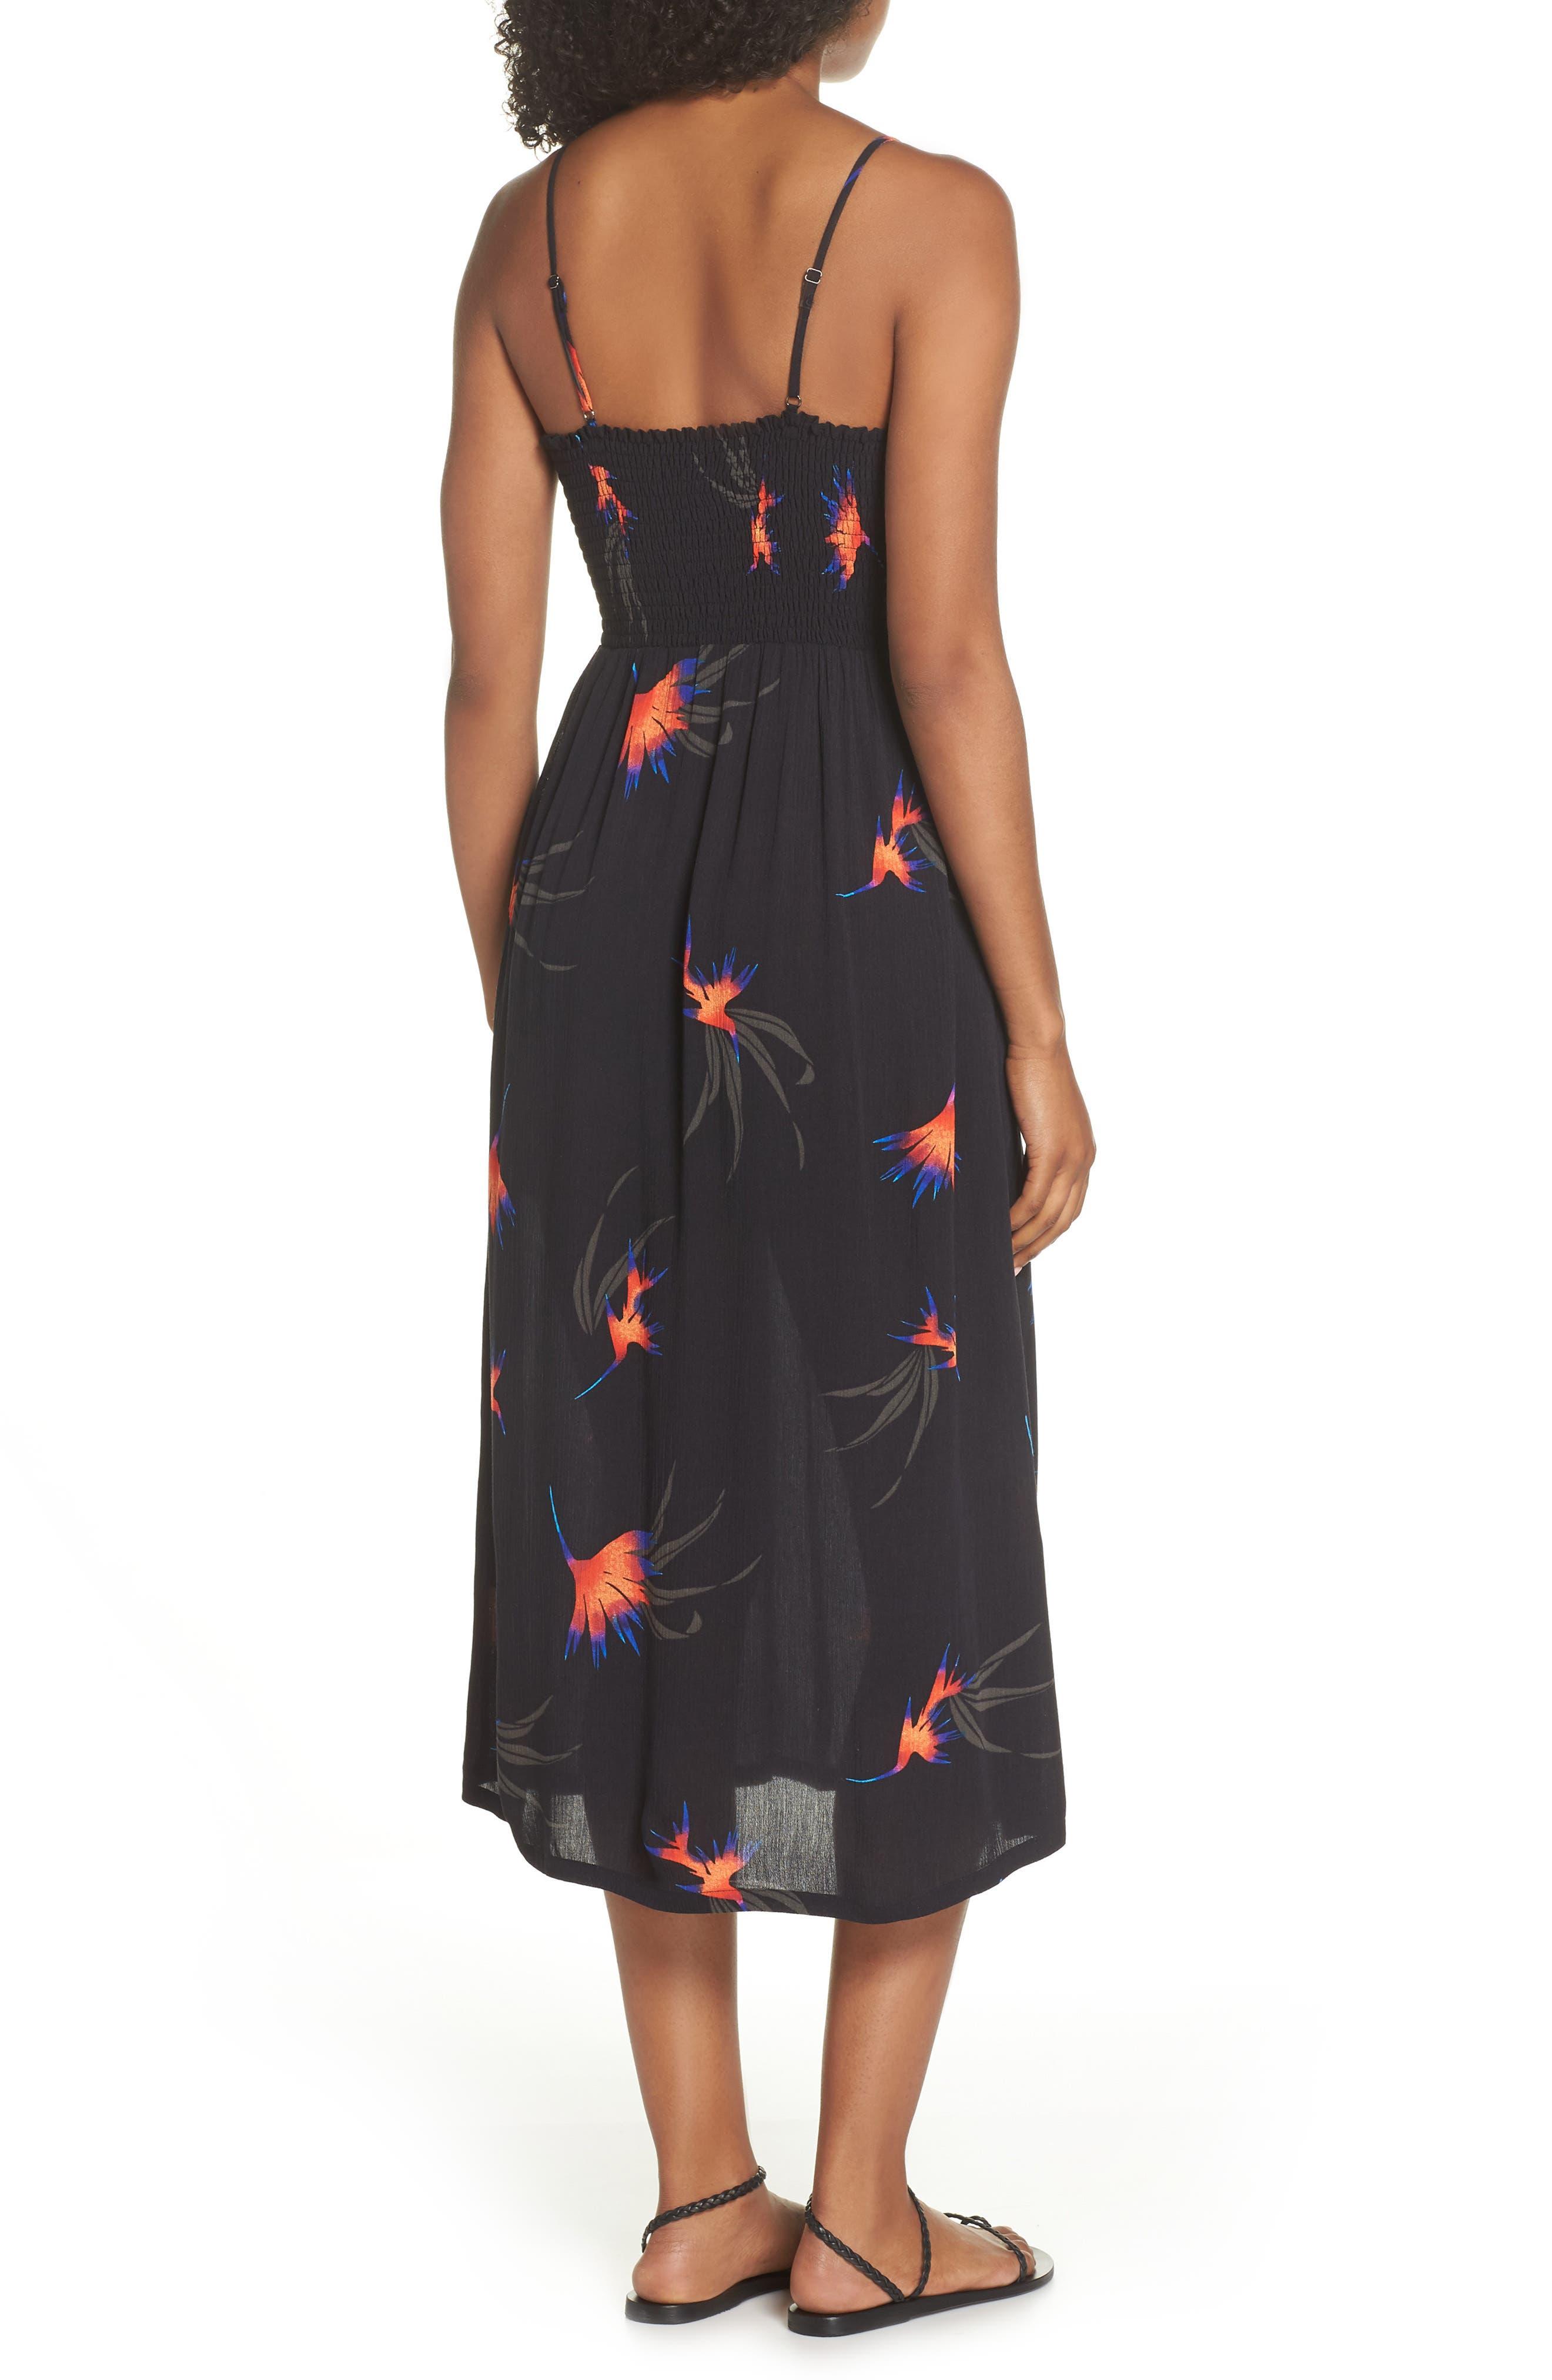 Sydney Midi Dress,                             Alternate thumbnail 2, color,                             Black Paradise City Print